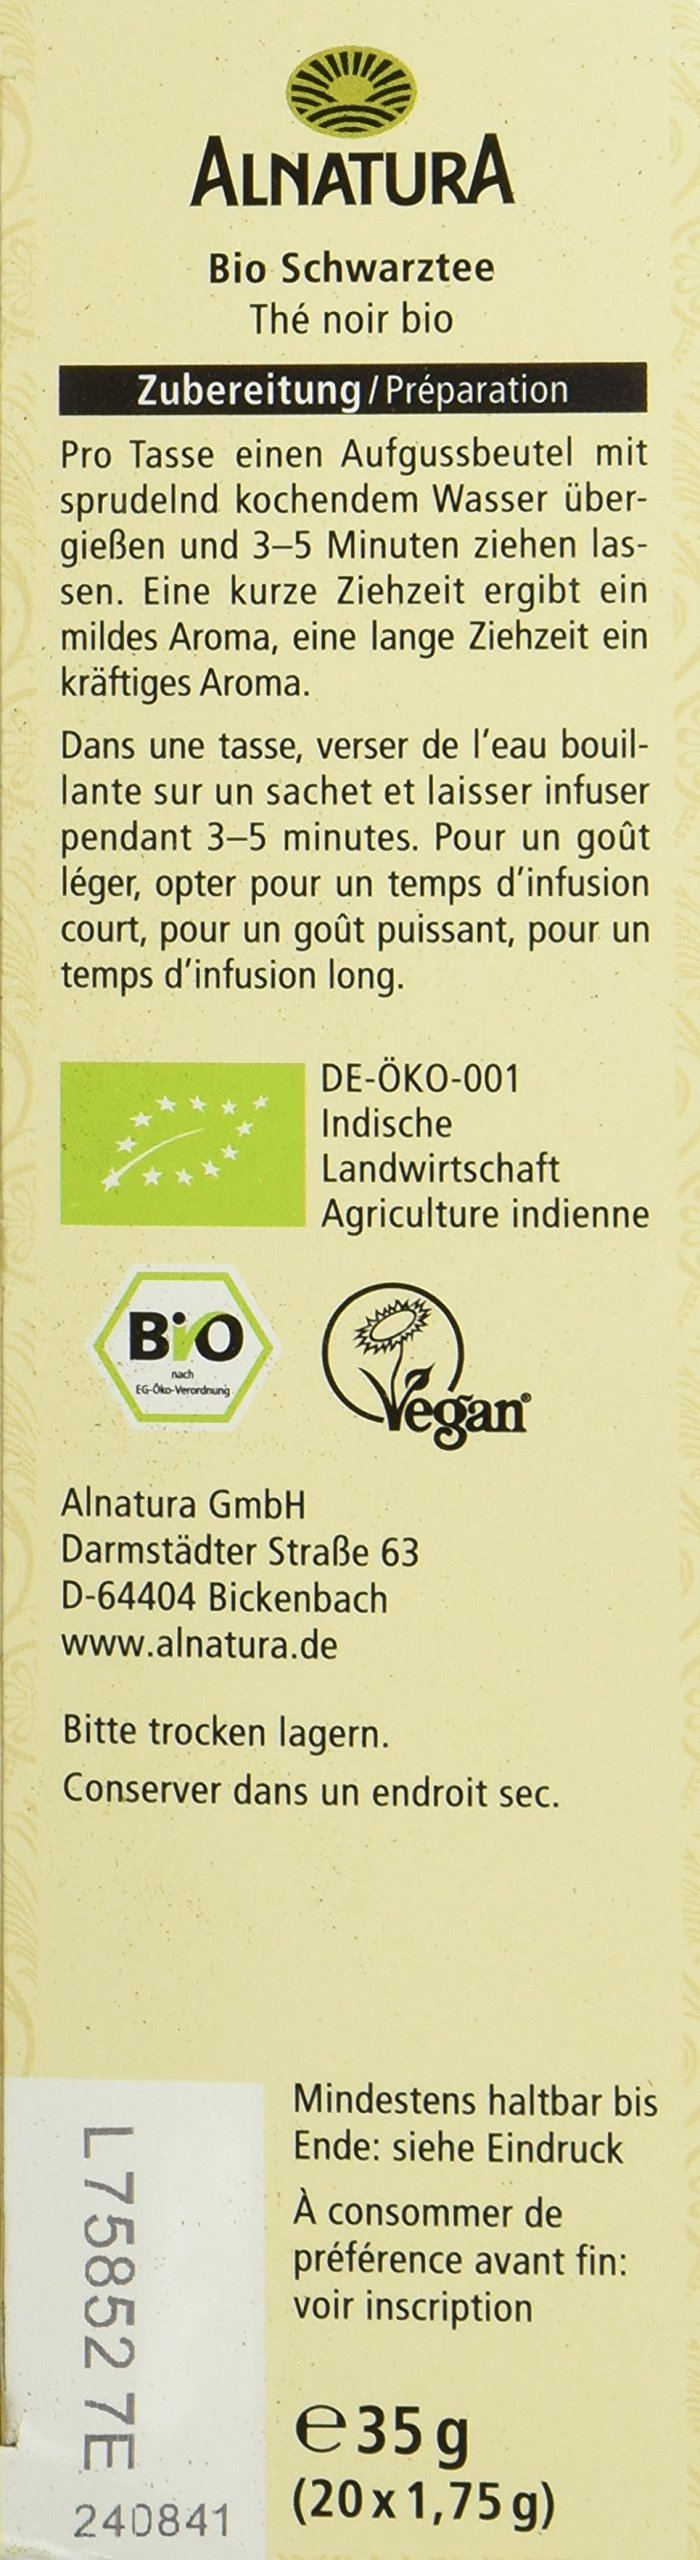 Alnatura-Bio-Schwarztee-20-Beutel-35-g